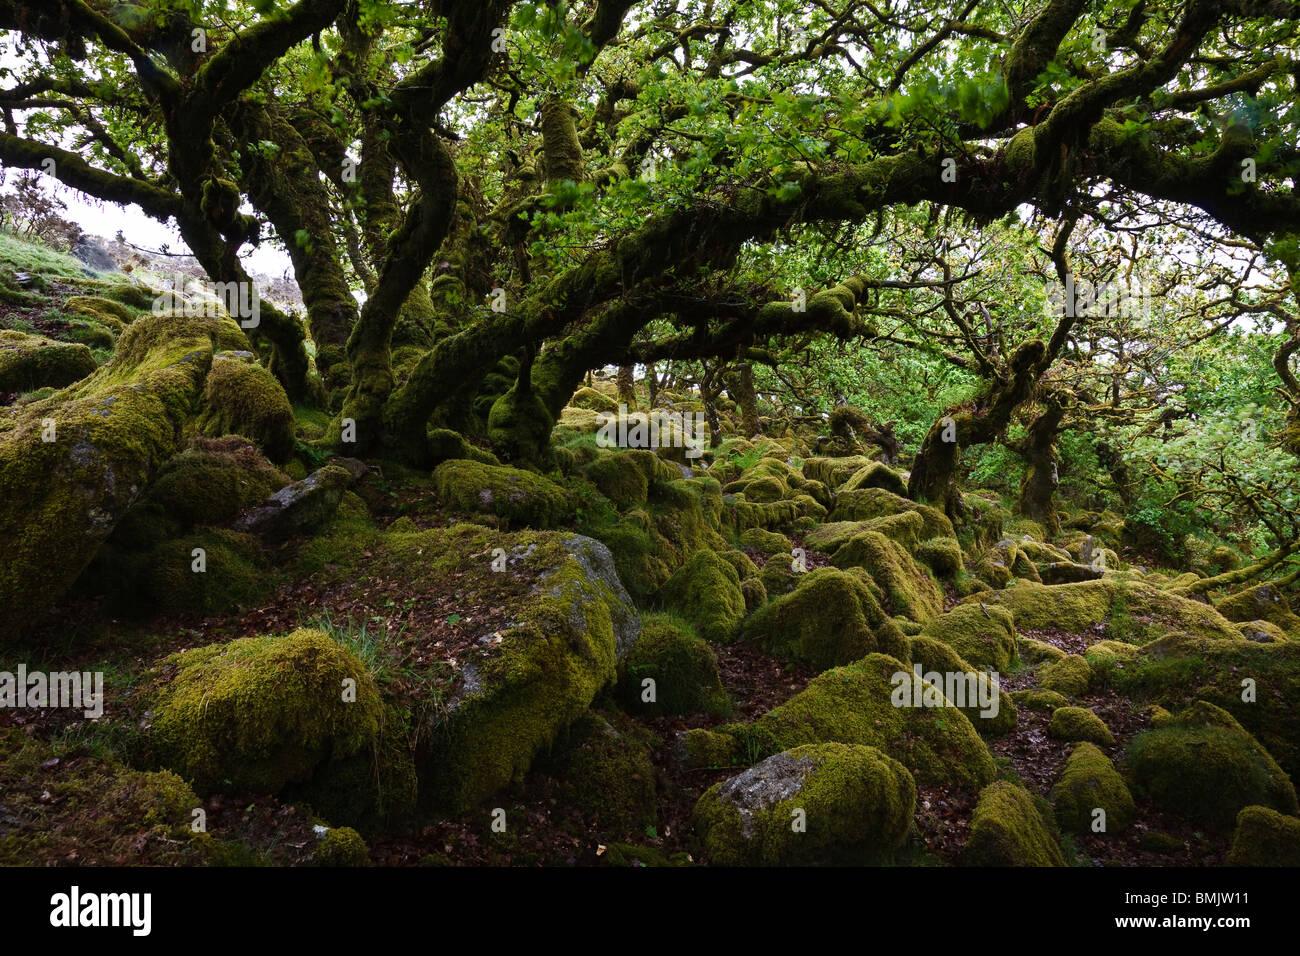 Ancient oak trees in Wistmans Wood, Dartmoor National Park, Devon, England Stock Photo